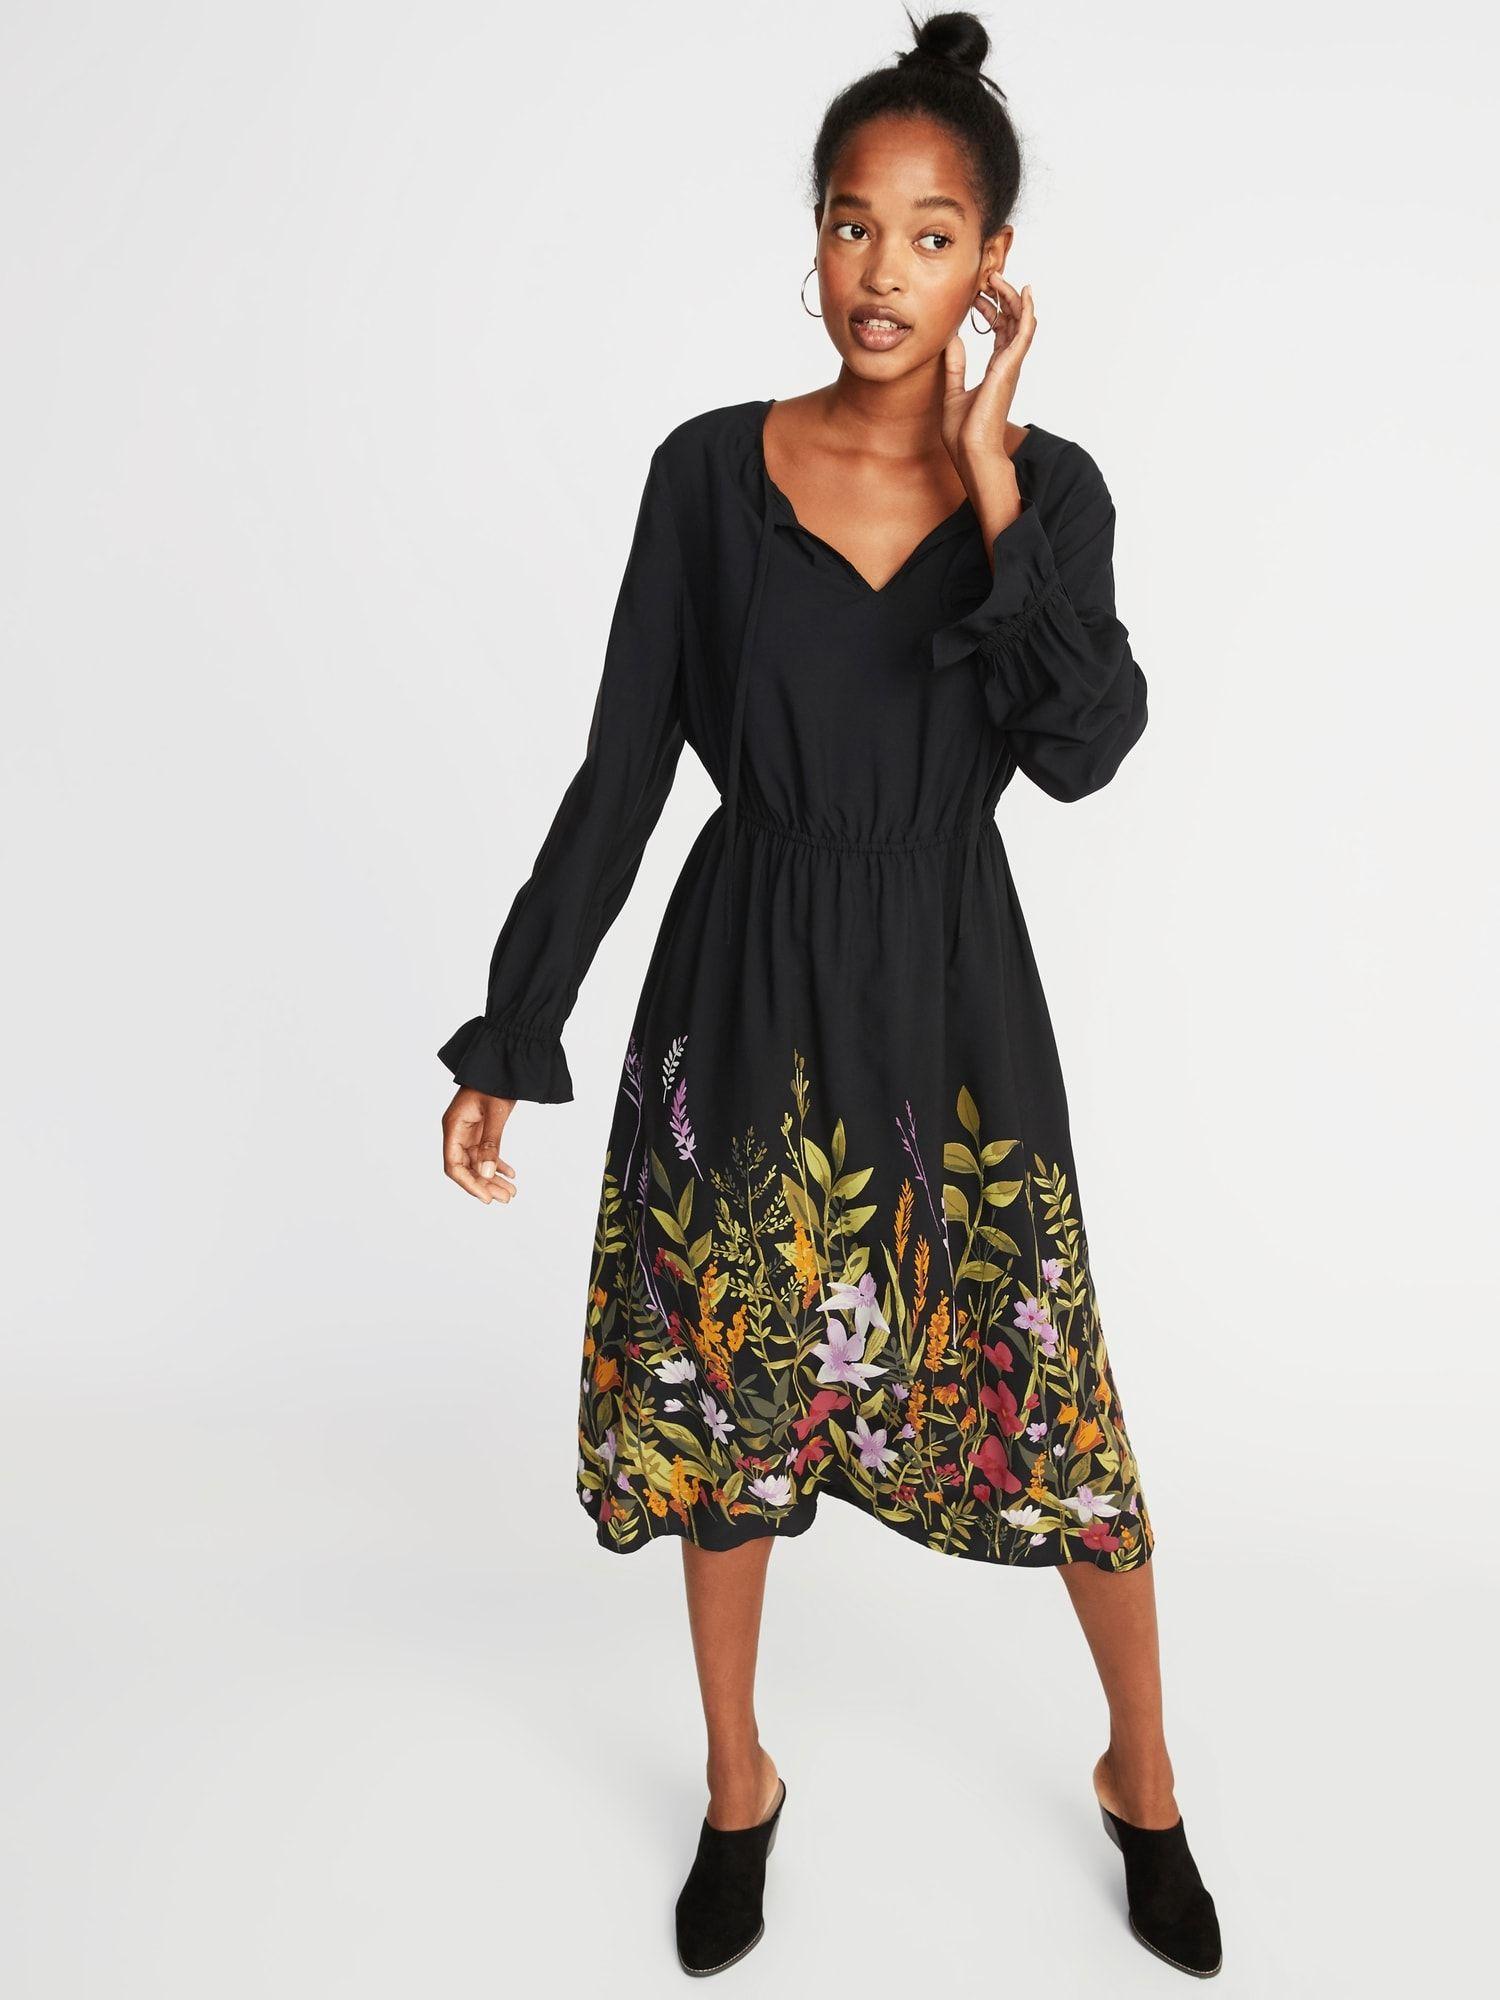 Poet Sleeve Waist Defined Midi For Women Old Navy